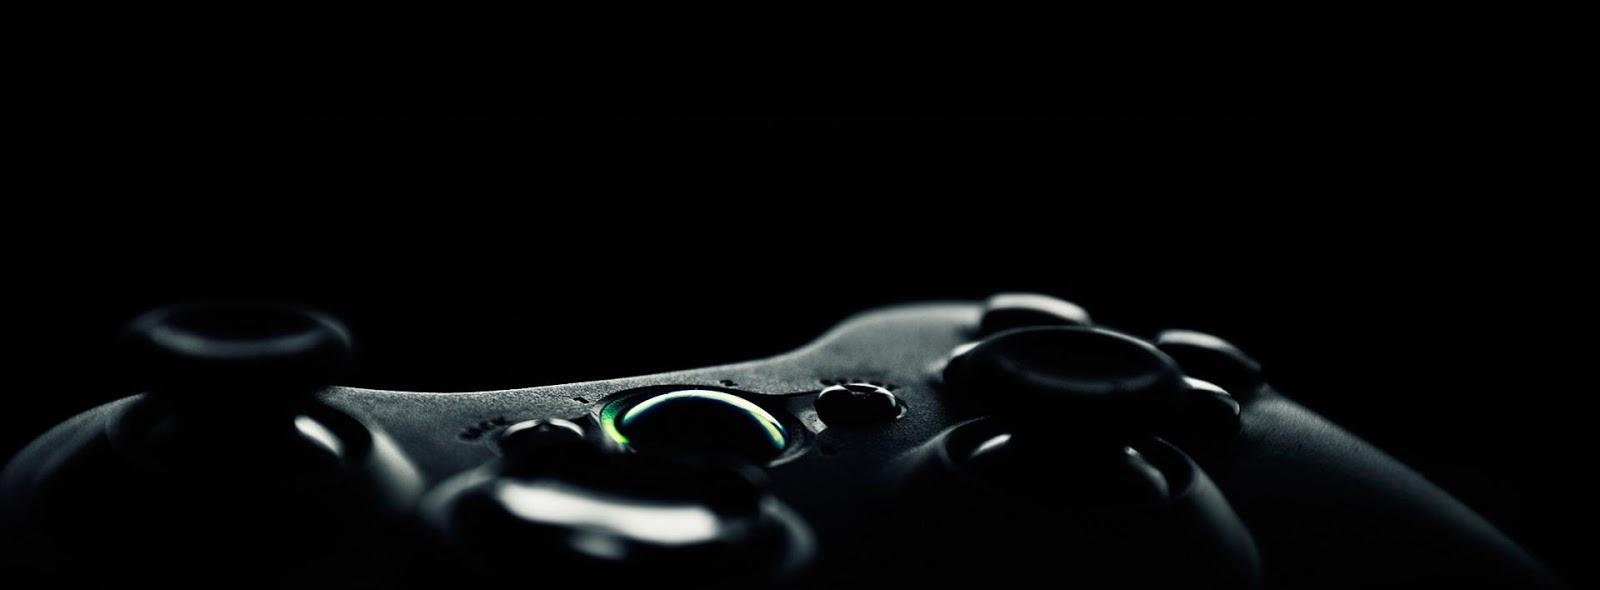 Playstation 4 Wallpape...